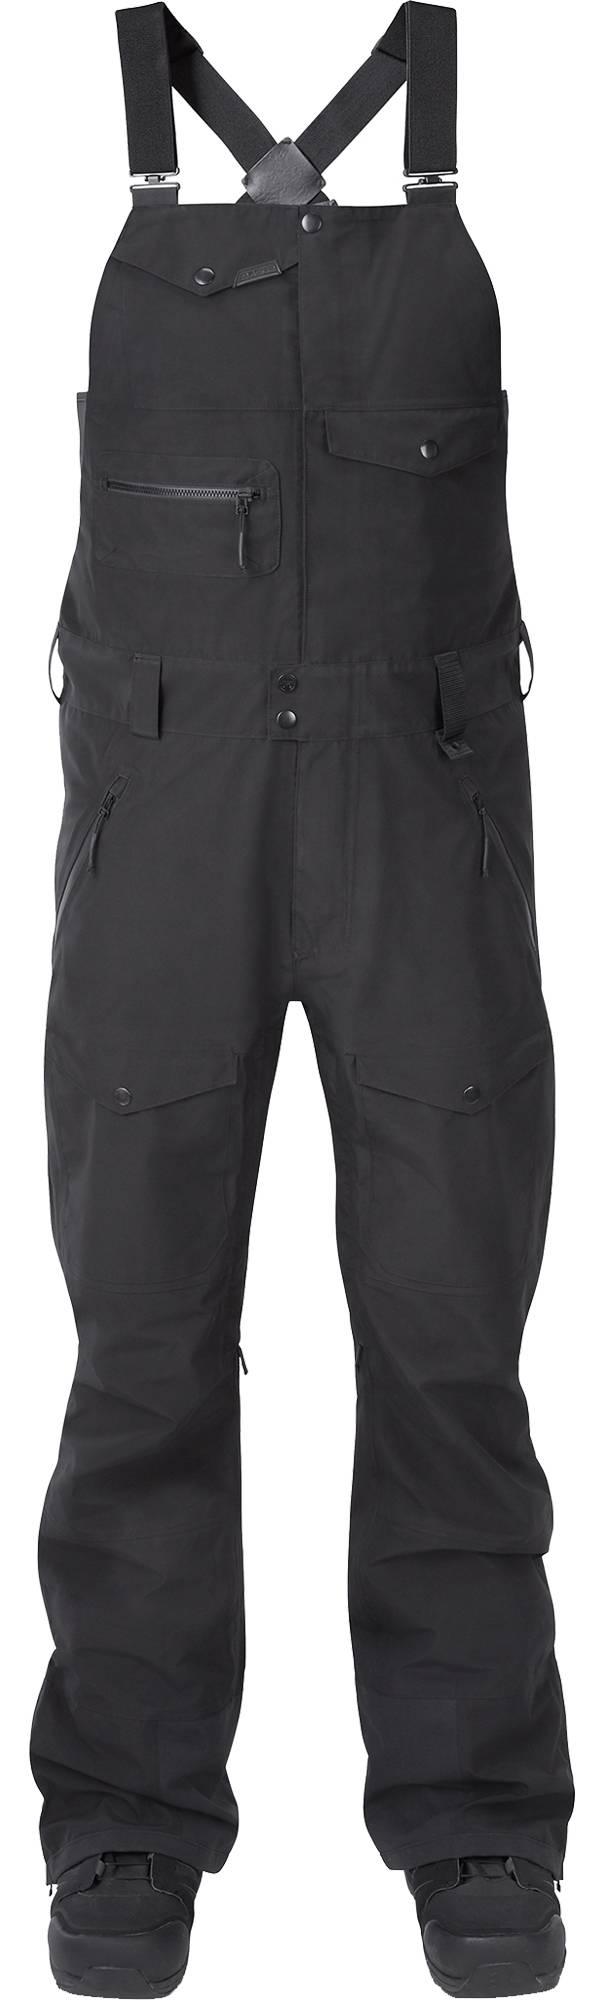 DAKINE Men's Stoker GORE-TEX 3L Snow Bib product image